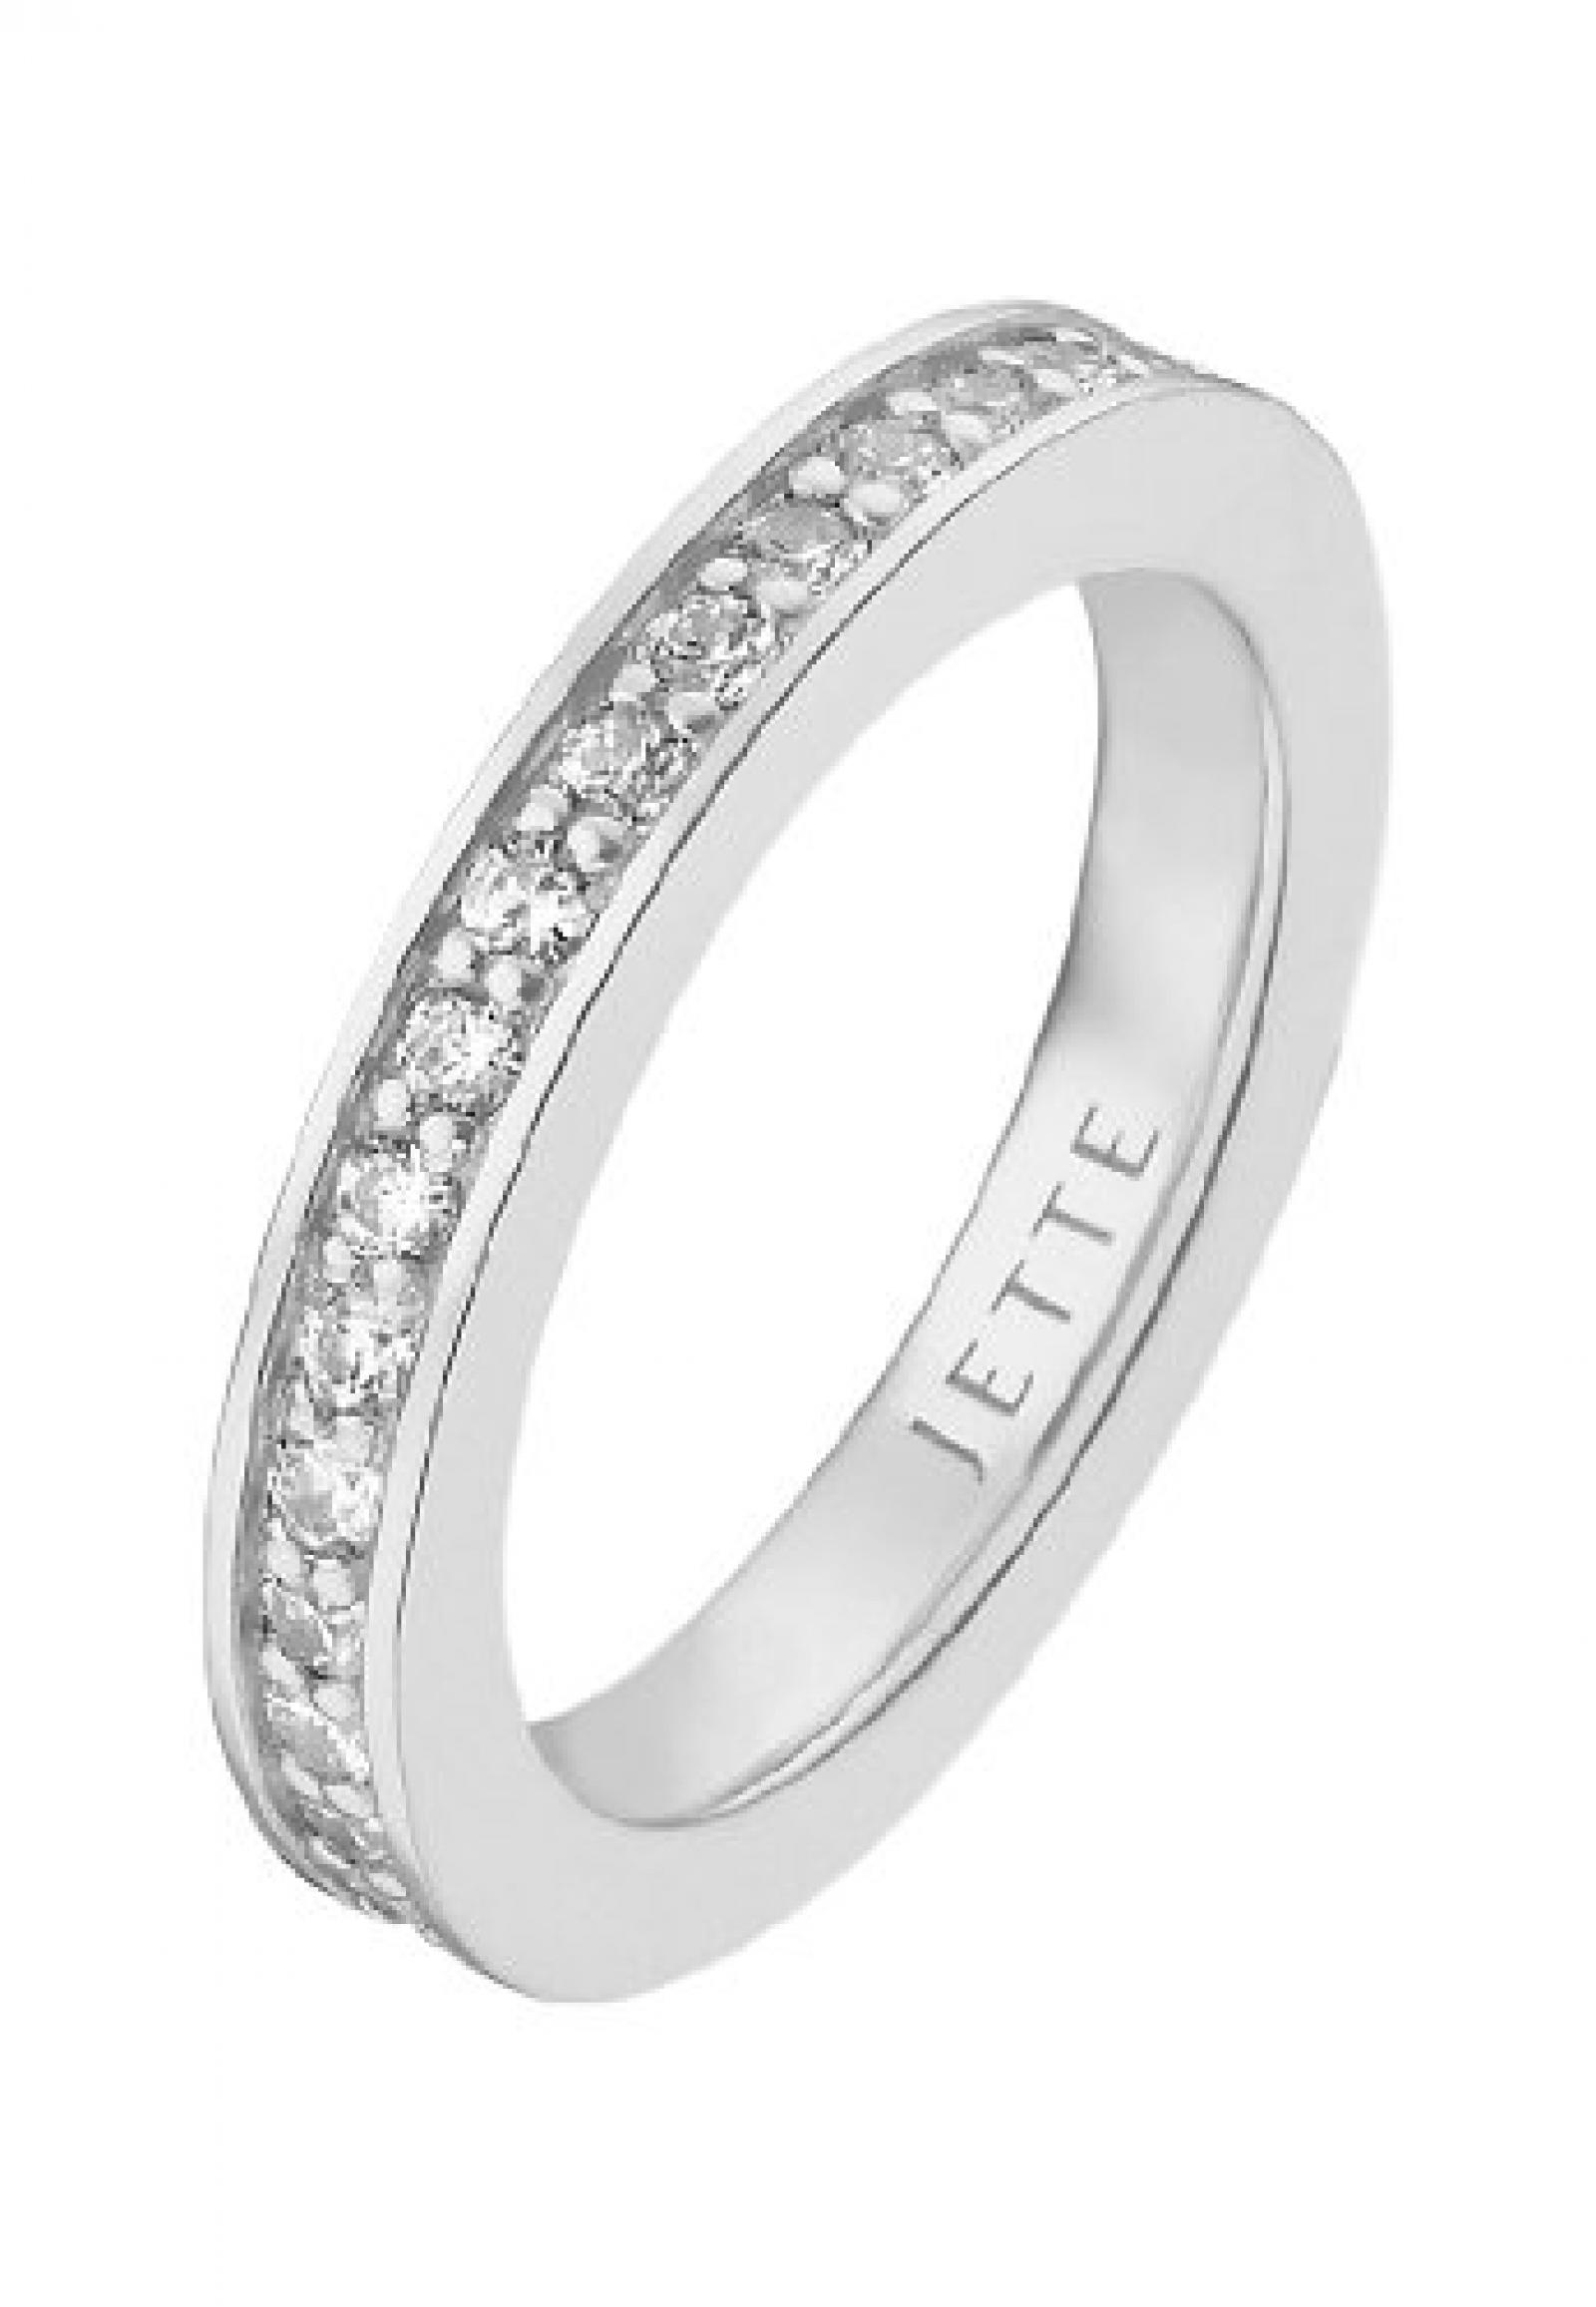 JETTE Silver Damen-Ring 925er Silber rhodiniert 34 Zirkonia (silber)